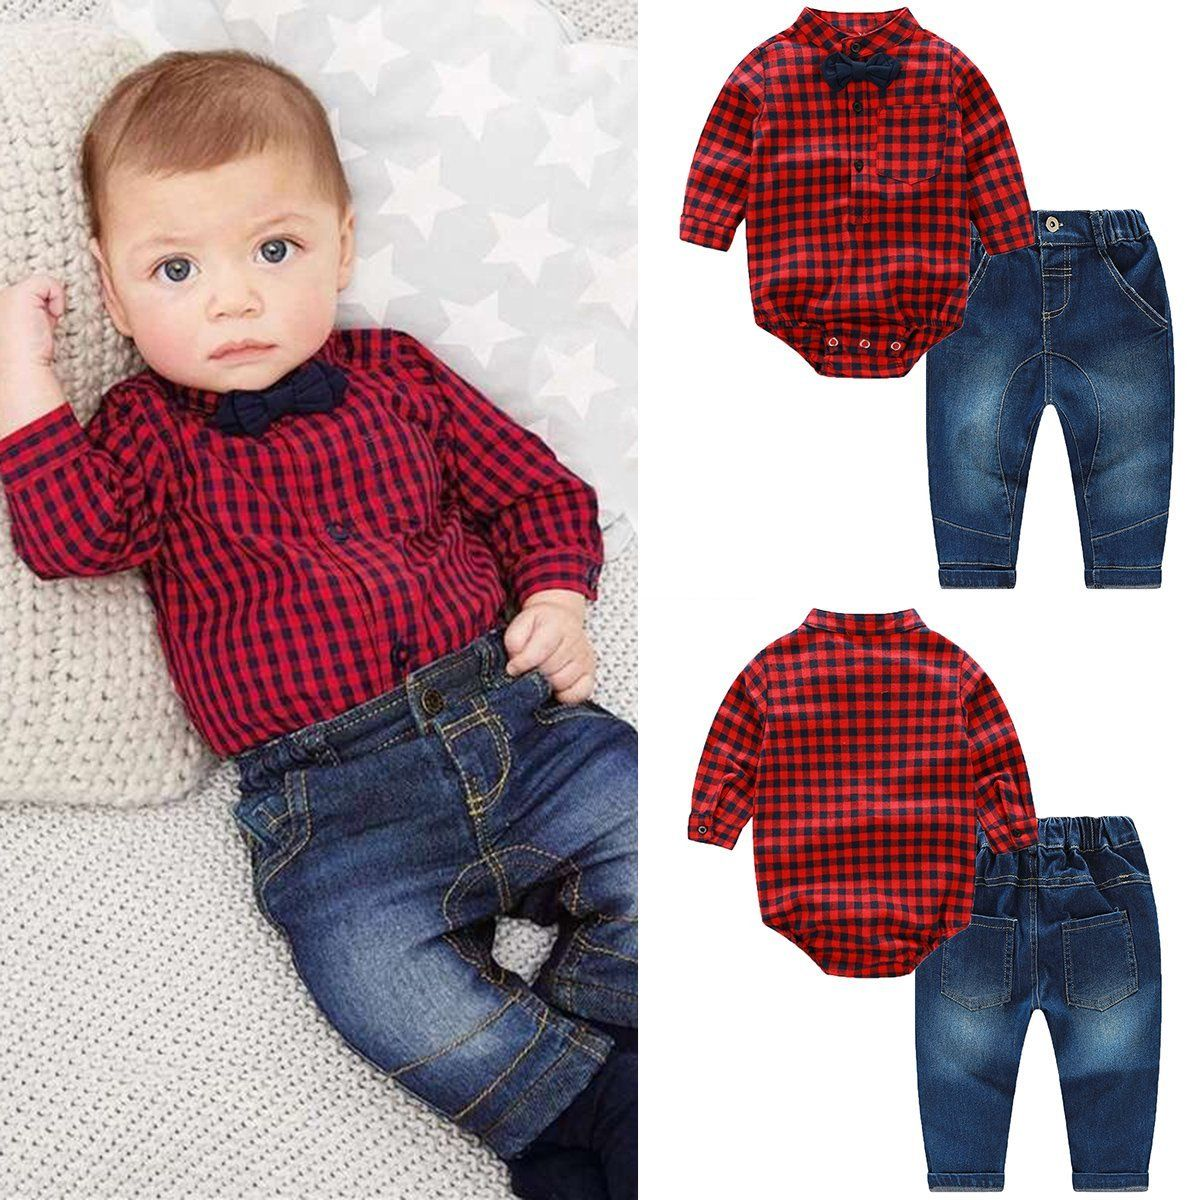 76817f81b  11.57 - 2Pcs Kids Baby Boys Gentleman Romper T-Shirt Tops+Denim ...